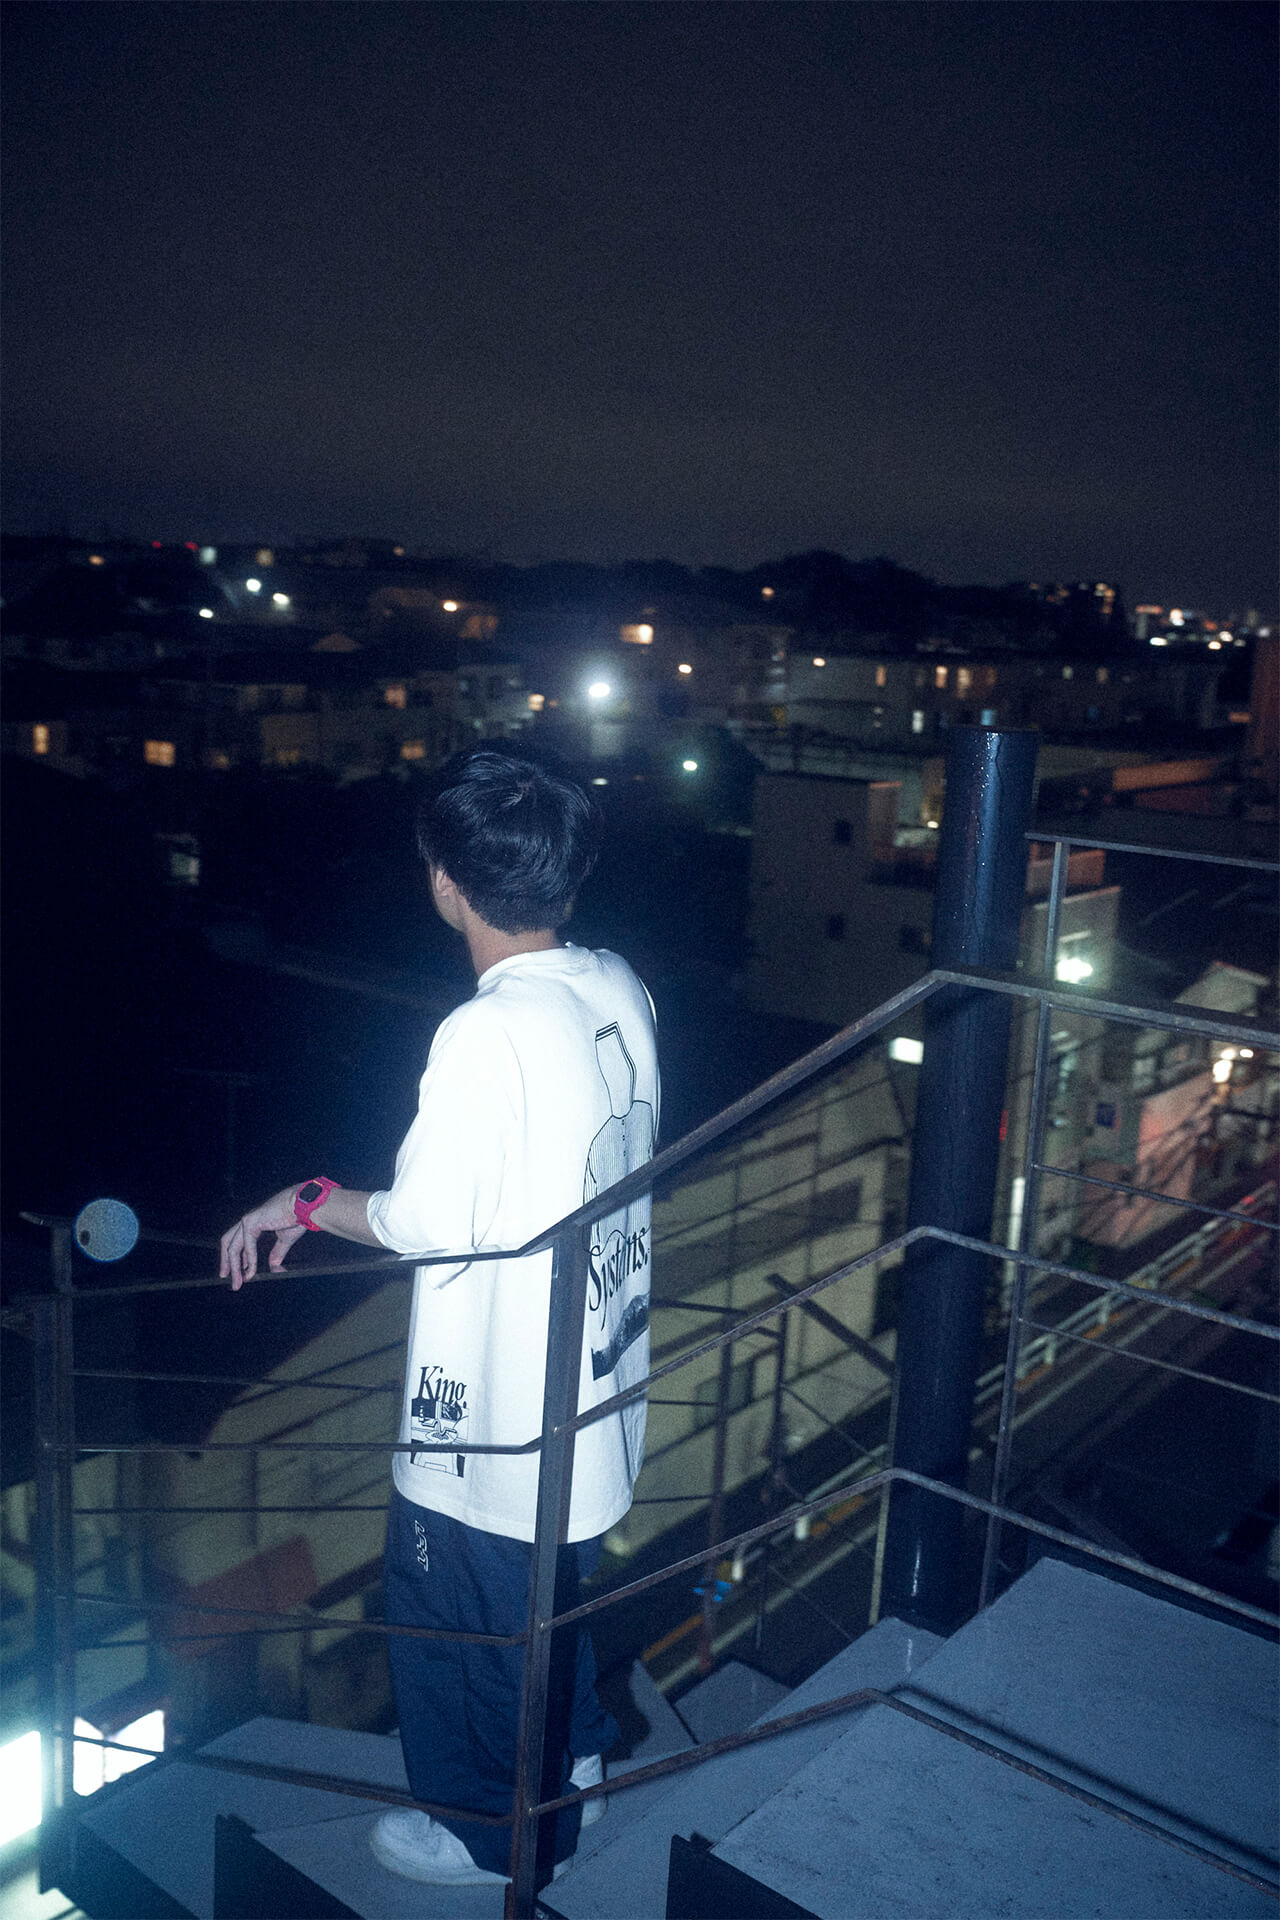 BACK TO THE SOUL BROTHA──hokuto、インタヴュー interview211008-hokuto-plums-10